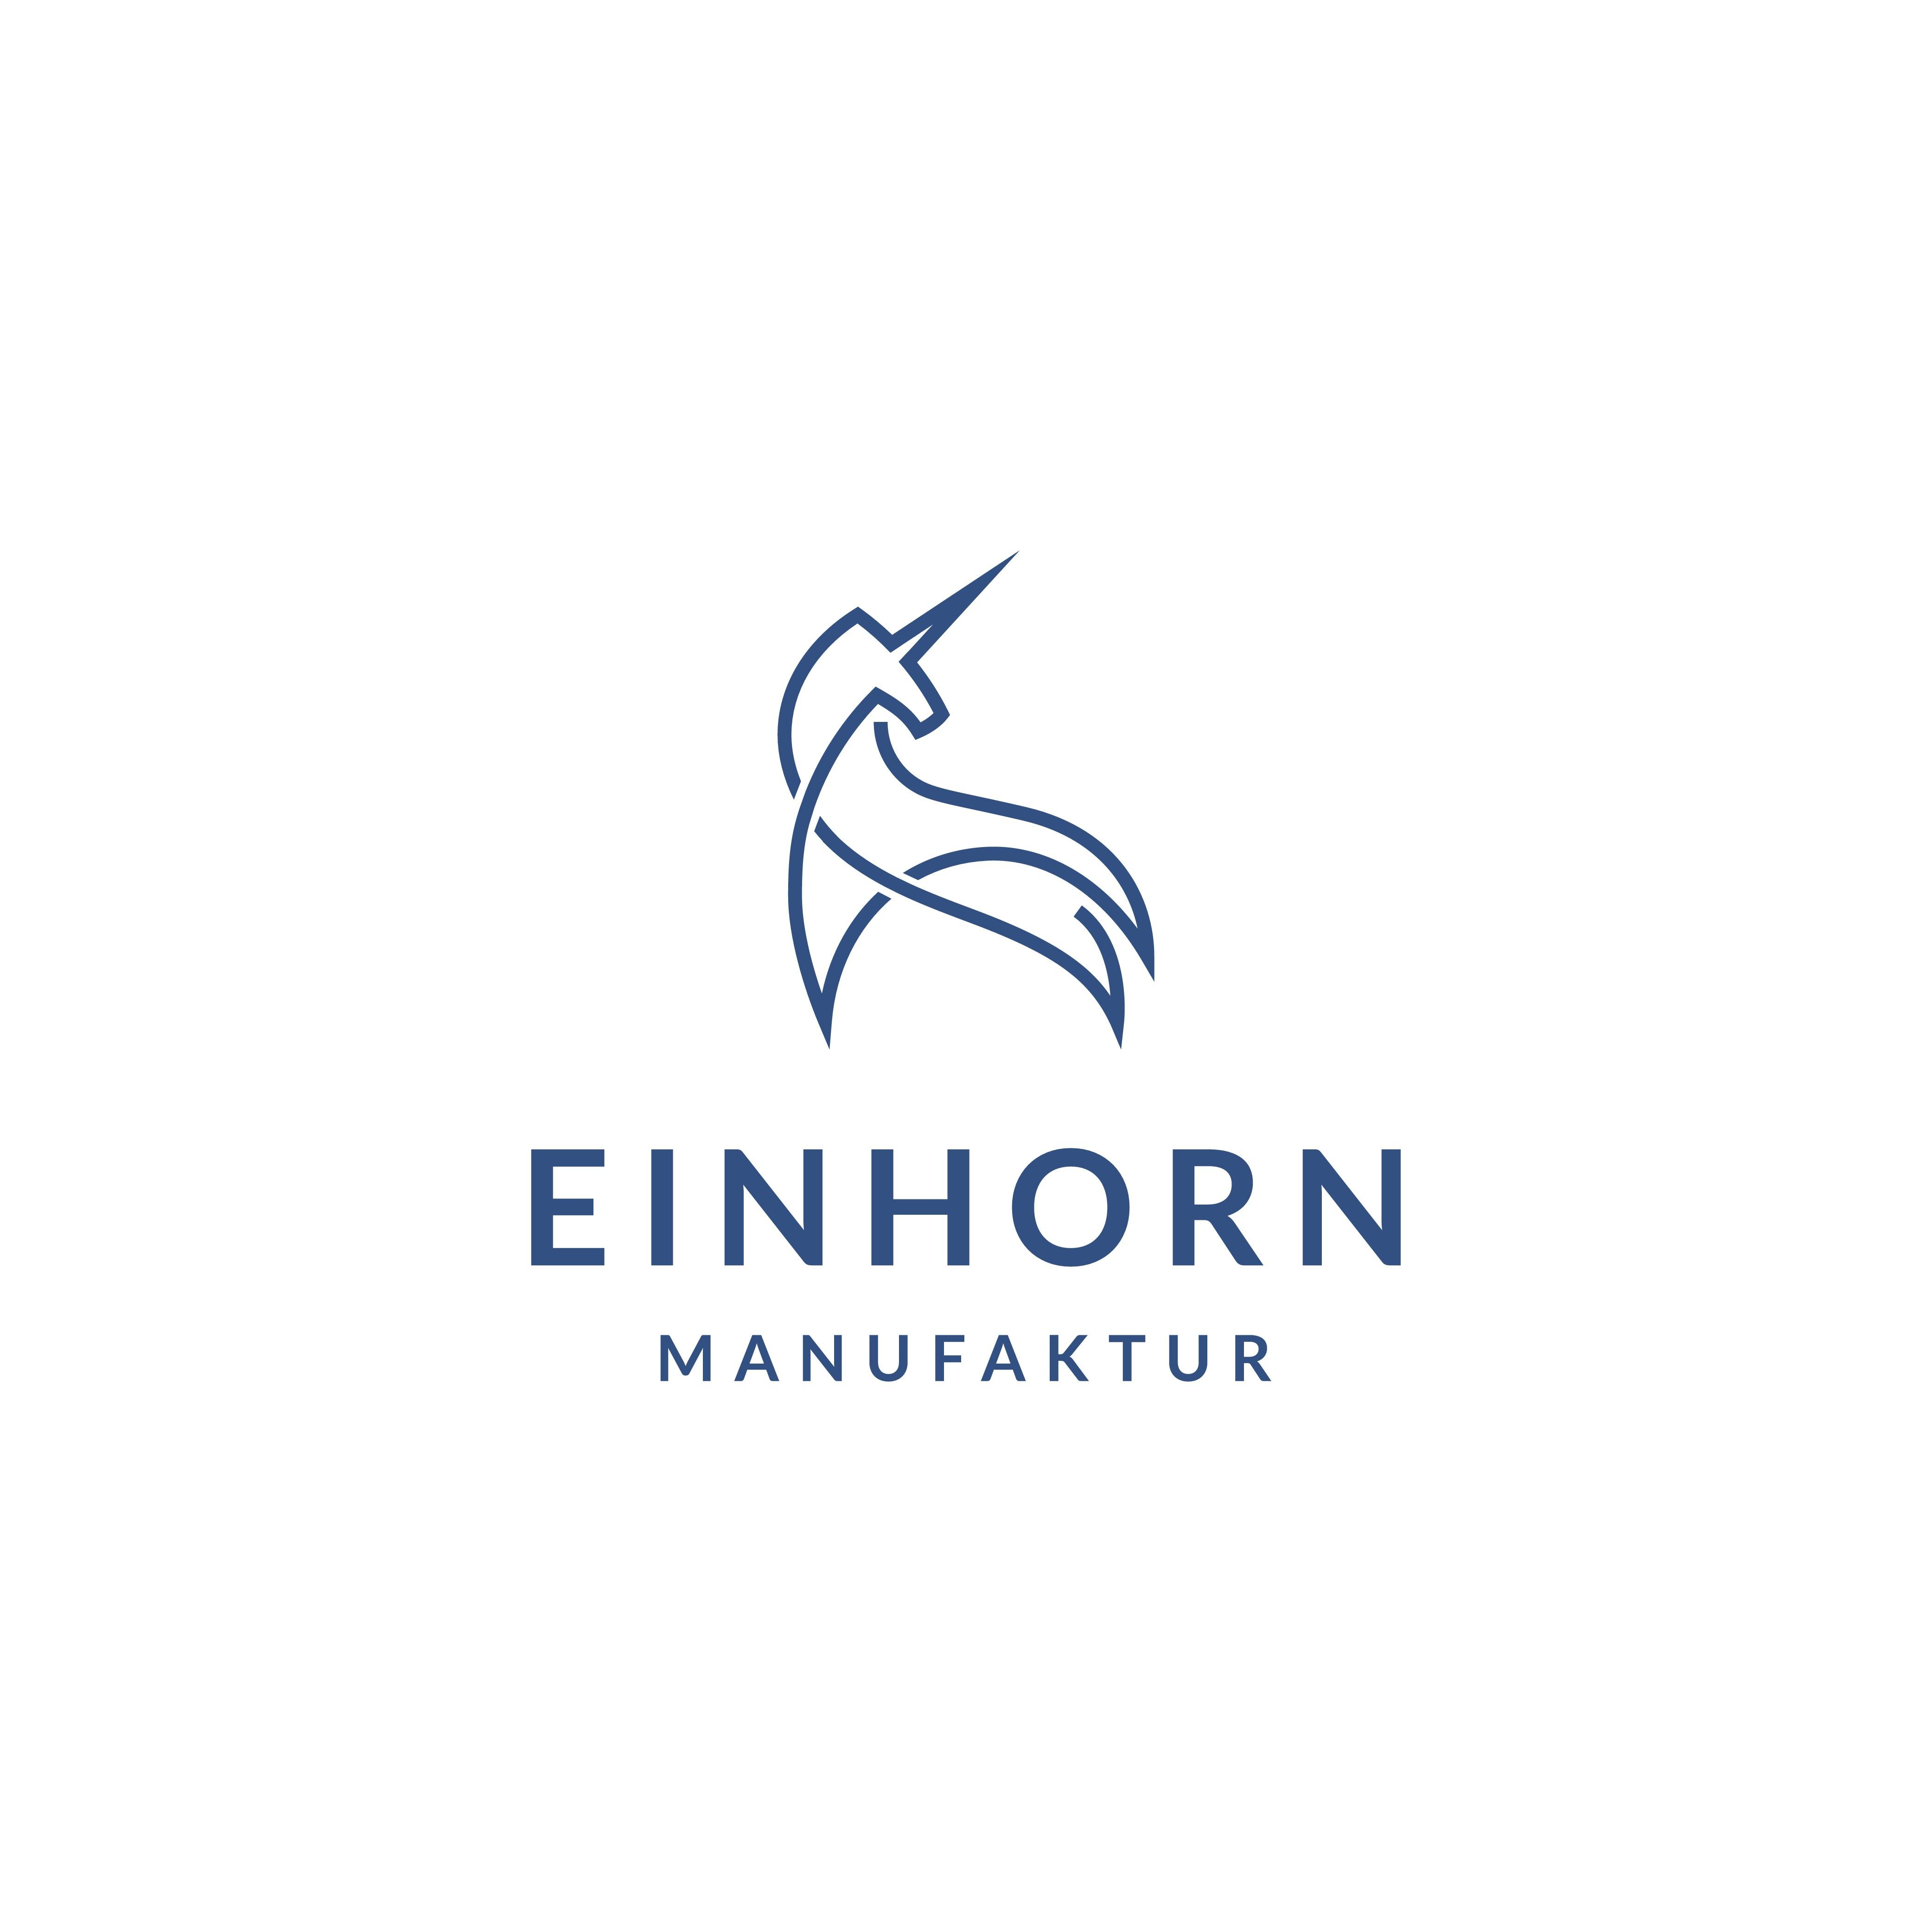 Make an unicornique logo - work with a unicorn!